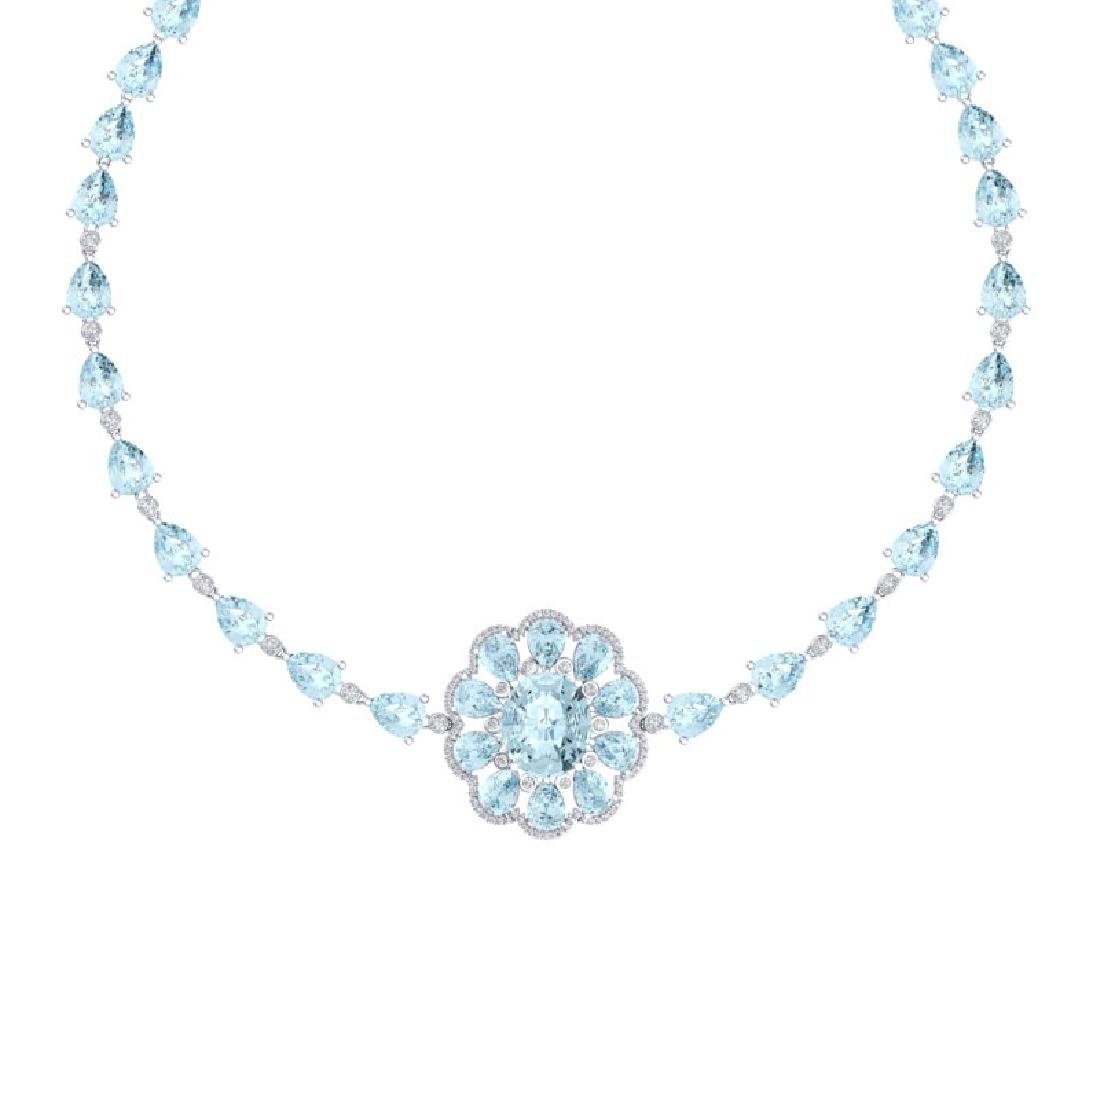 75.99 CTW Royalty Sky Topaz & VS Diamond Necklace 18K - 2